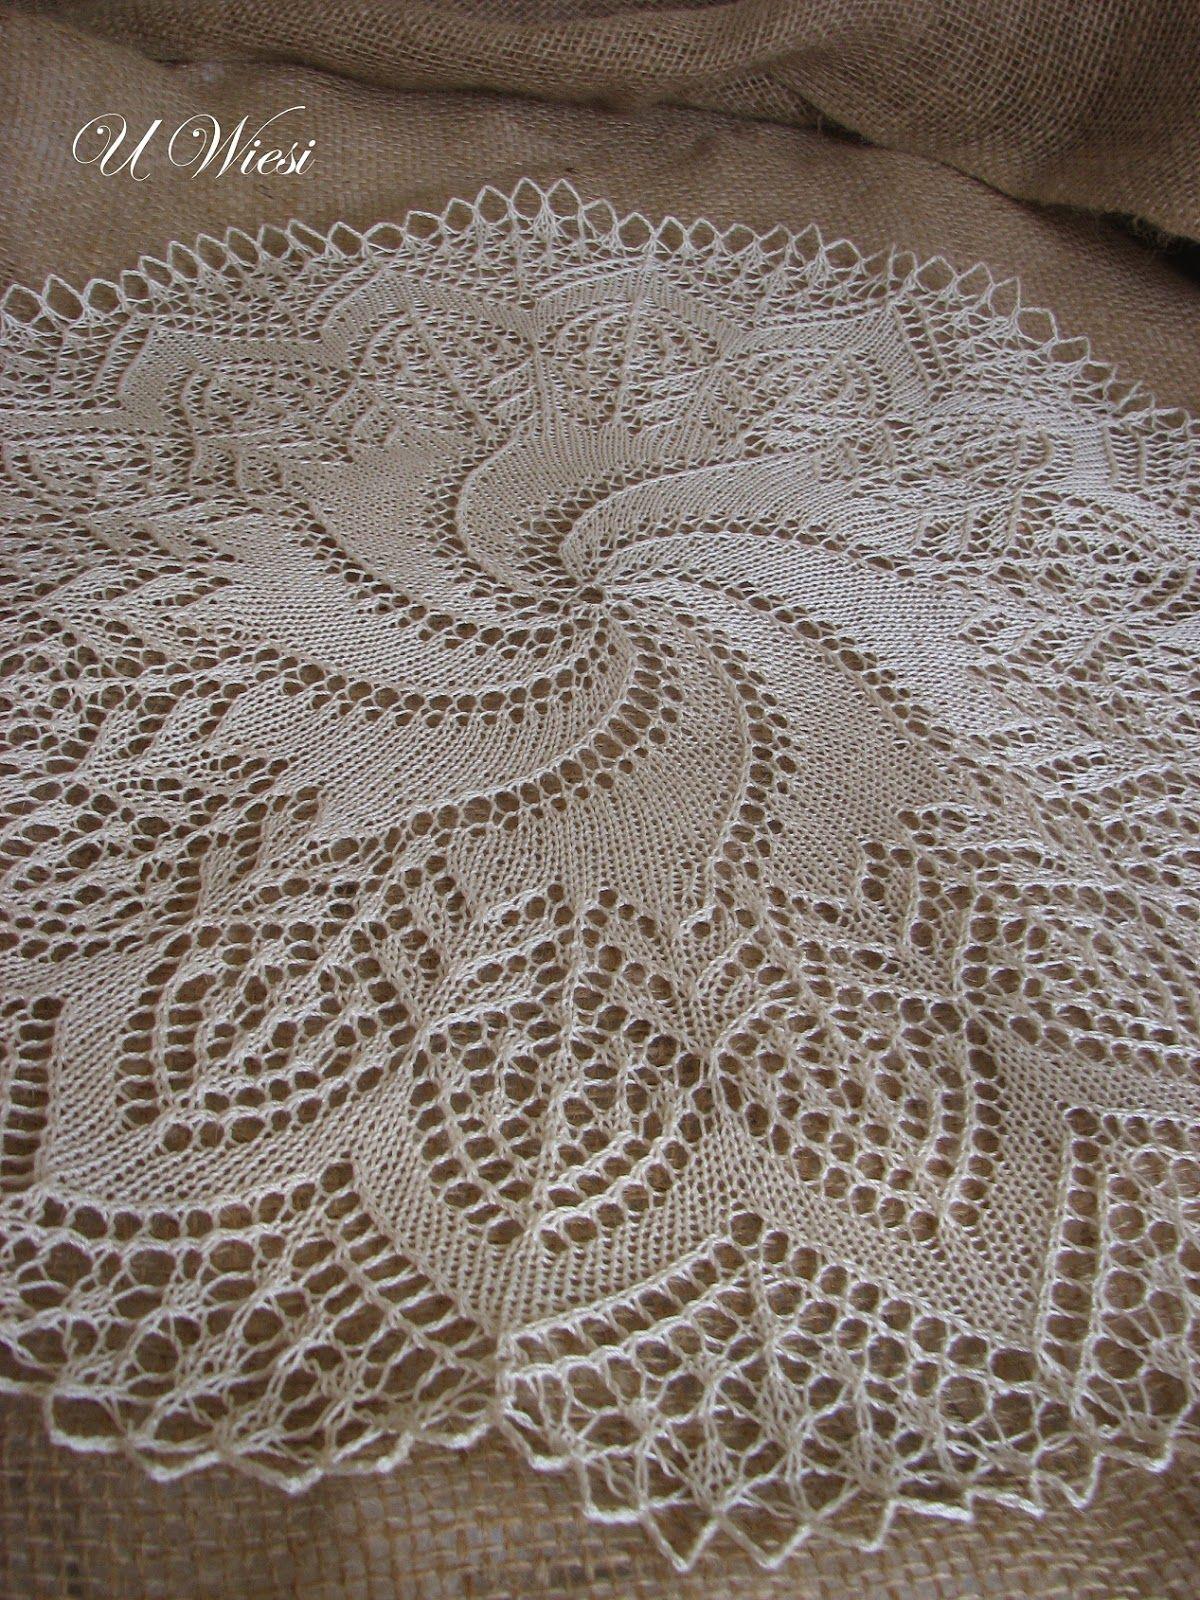 knitted doily | U Wiesi - tatting - knitting - frywolitki i druty ...